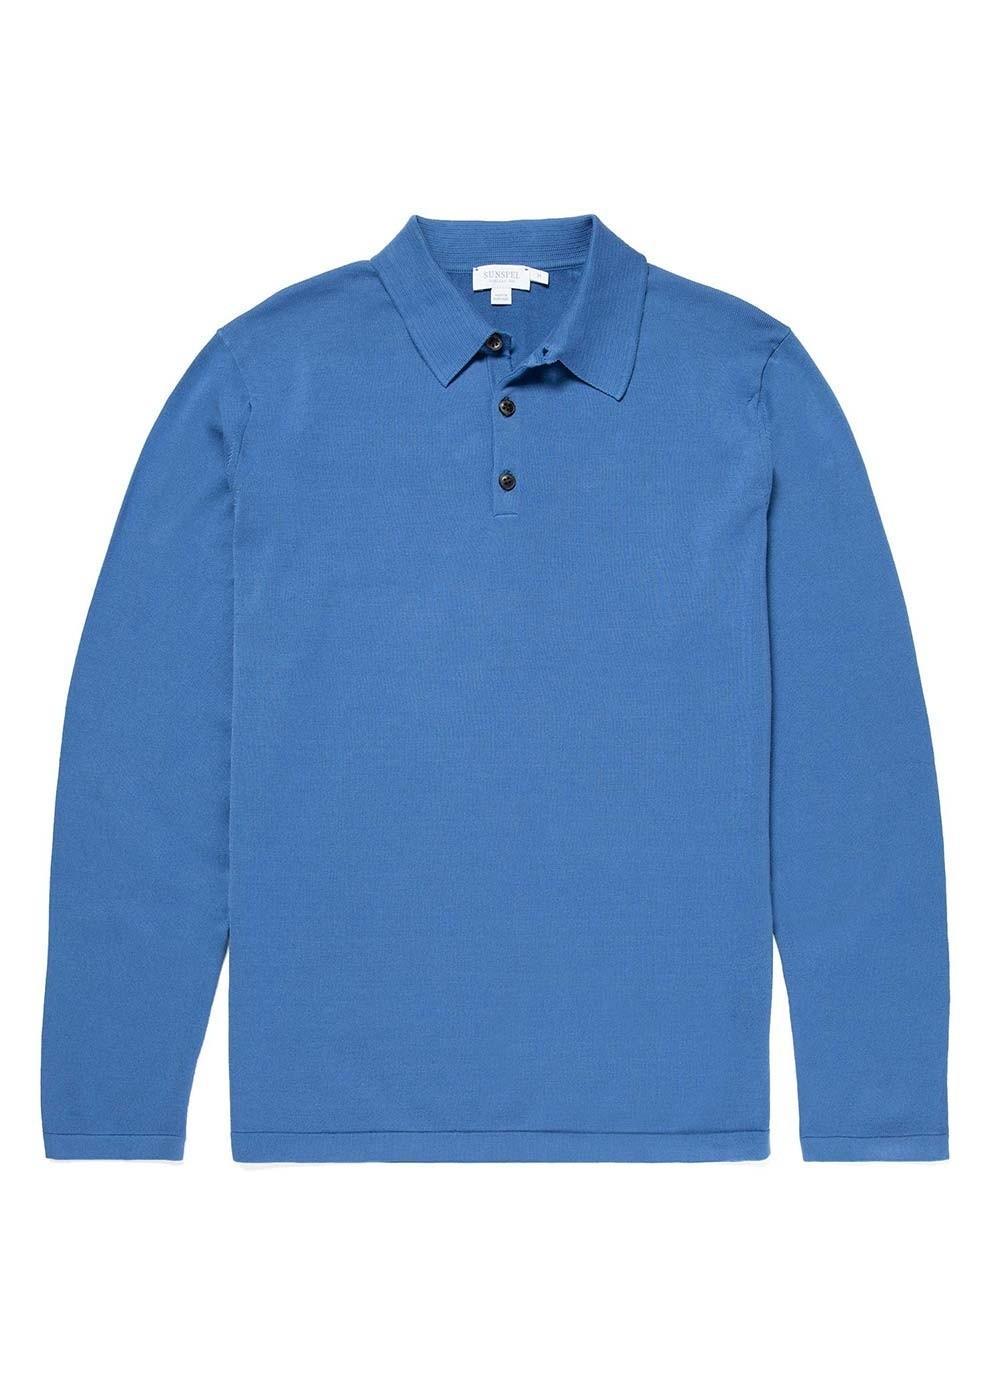 bf9bbde4 Sunspel Men's Sea Island Cotton Knit Long Sleeve Polo In Mid Indigo ...